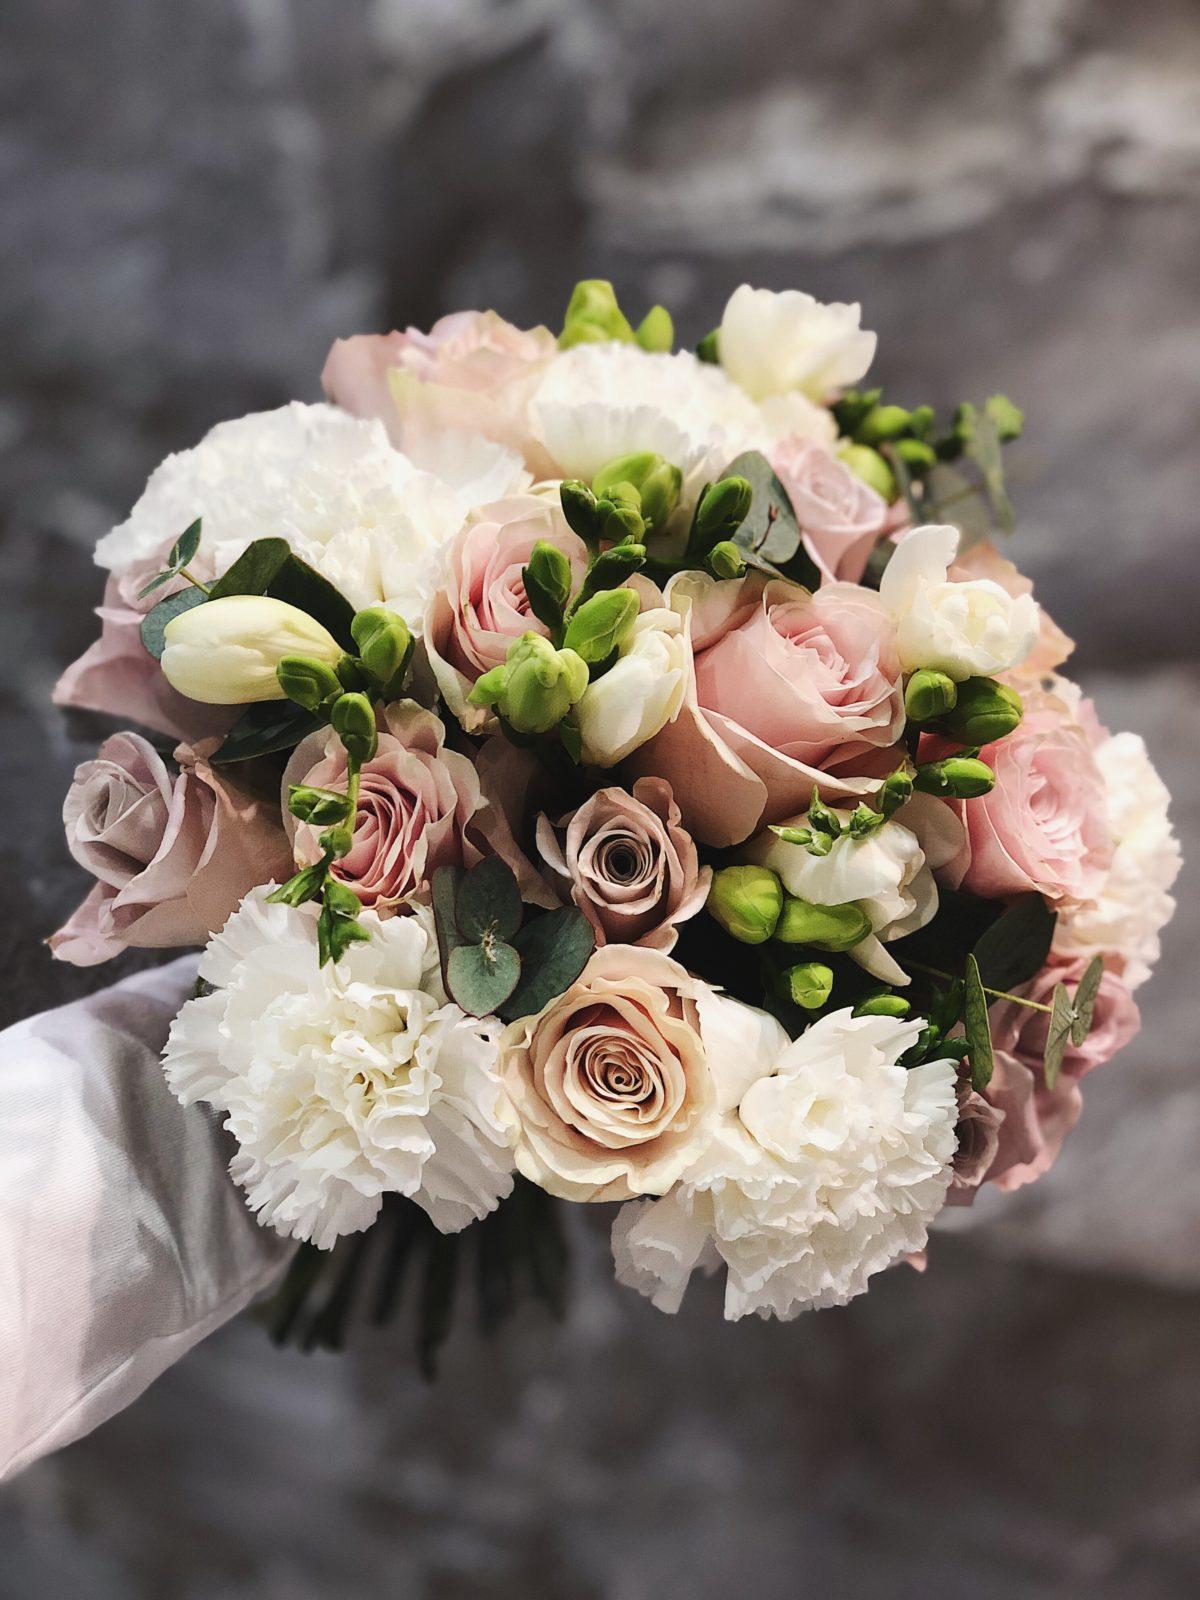 Свадебный букет заказ петербург, заказ 1500 рублей